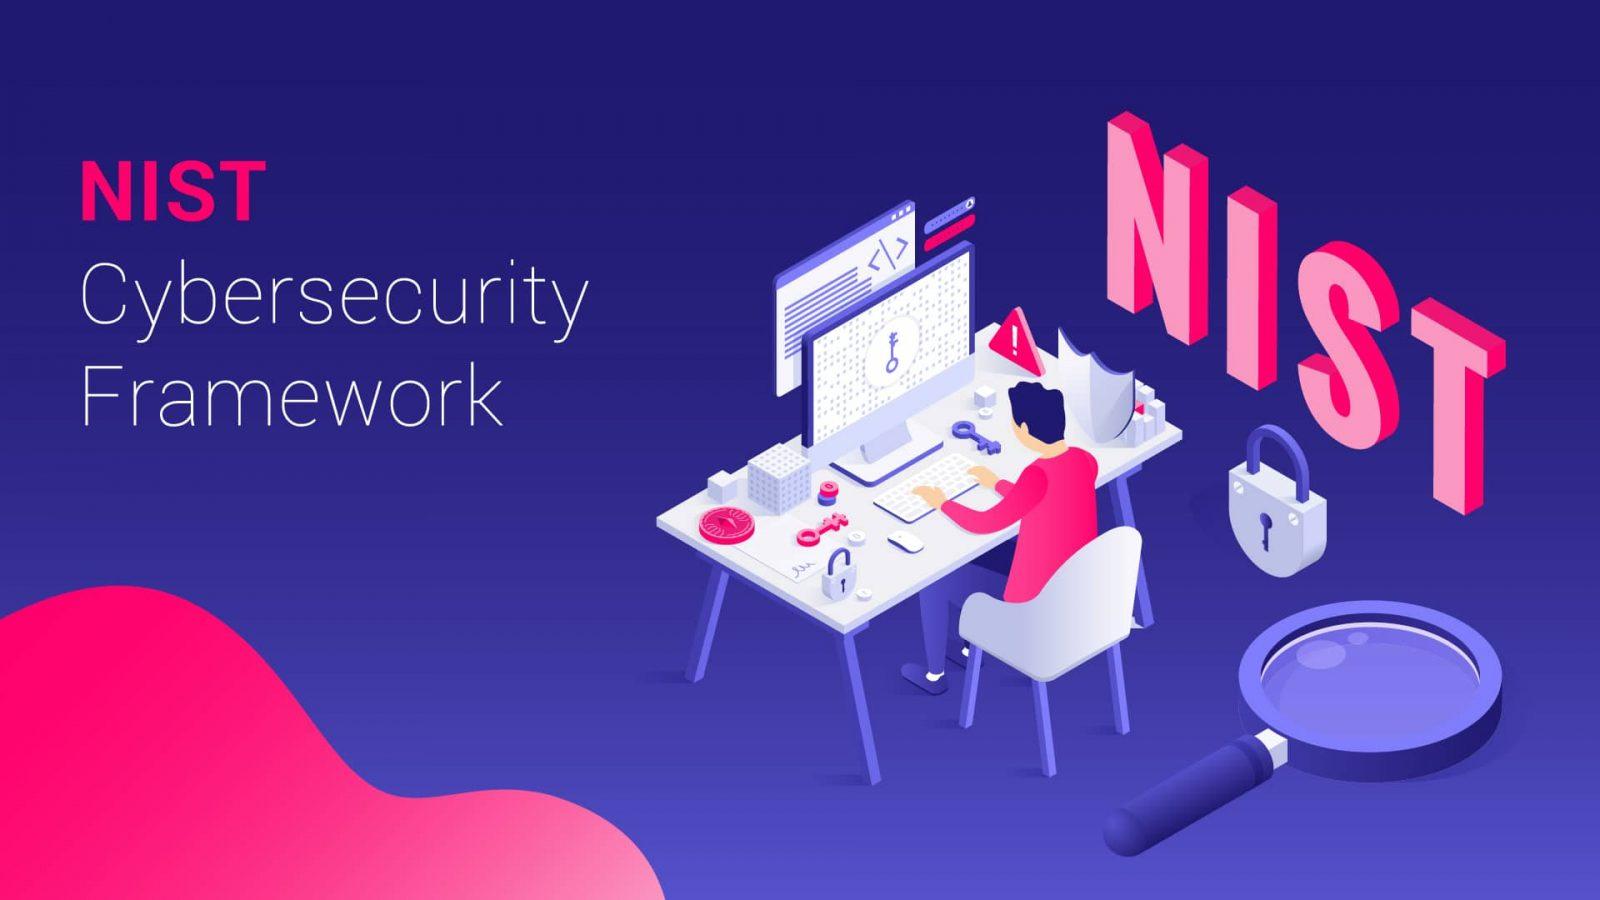 Understanding the NIST Cybersecurity Framework